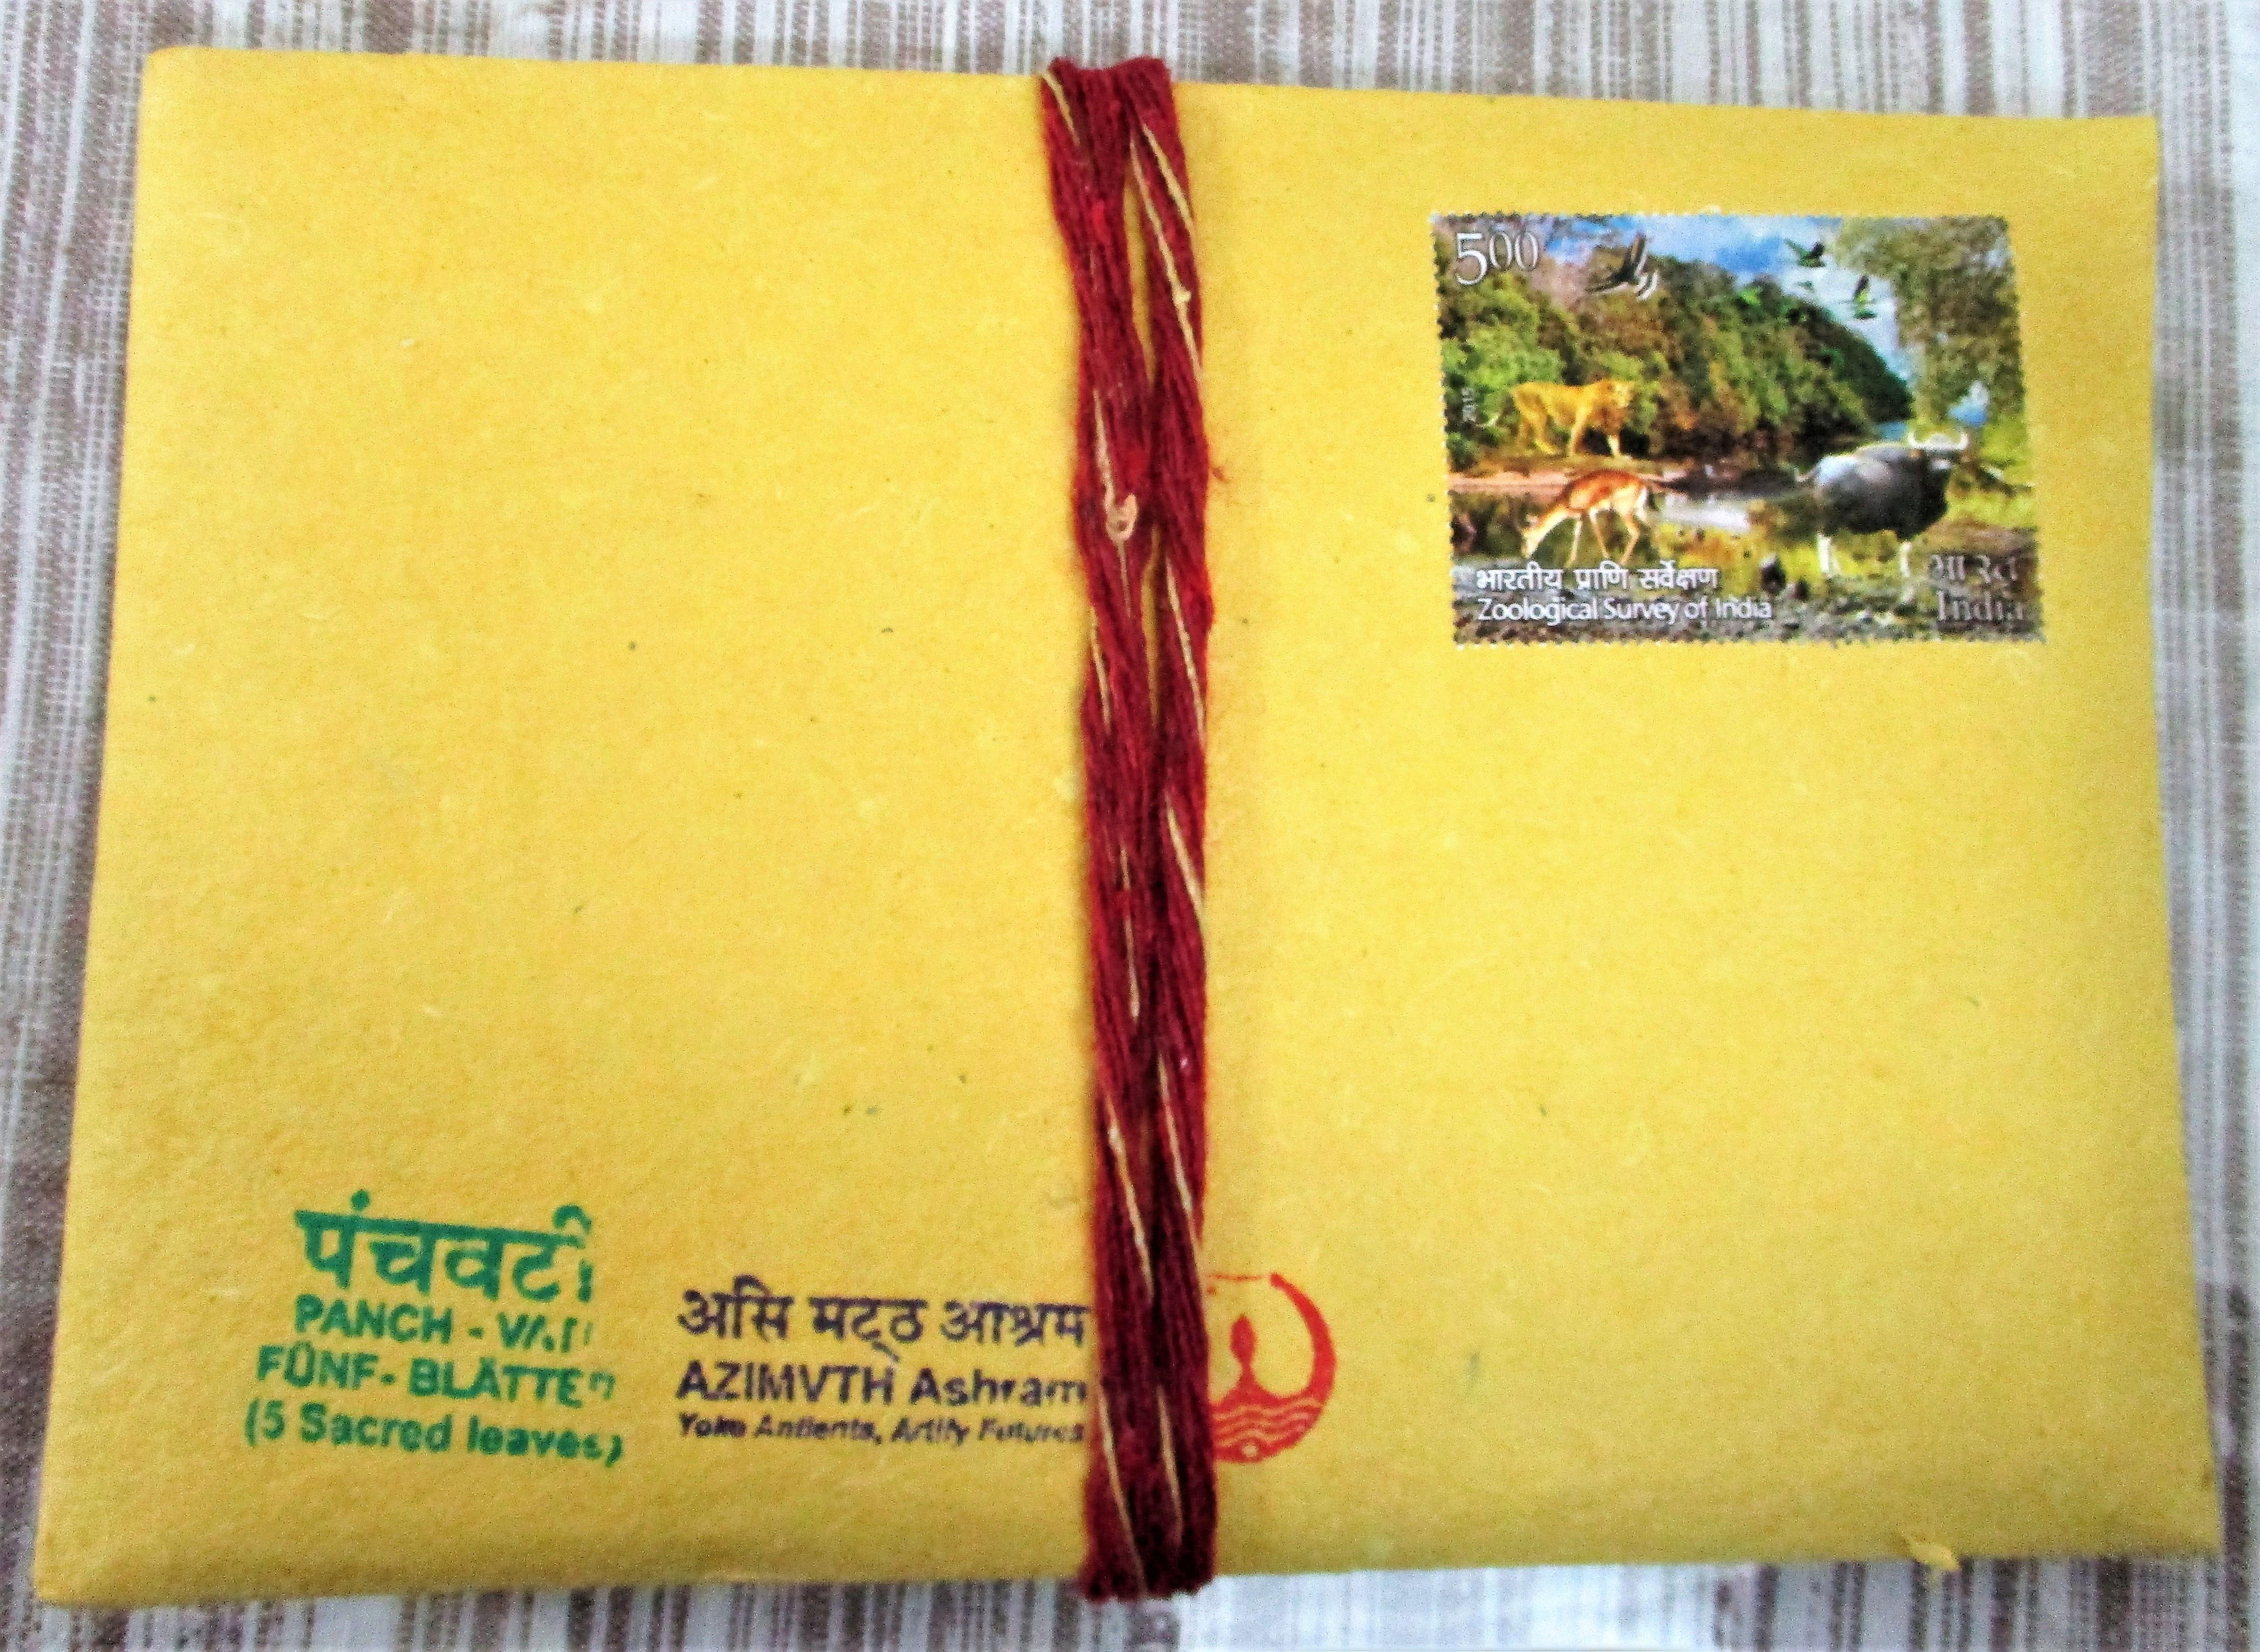 Panch Vati - Packet